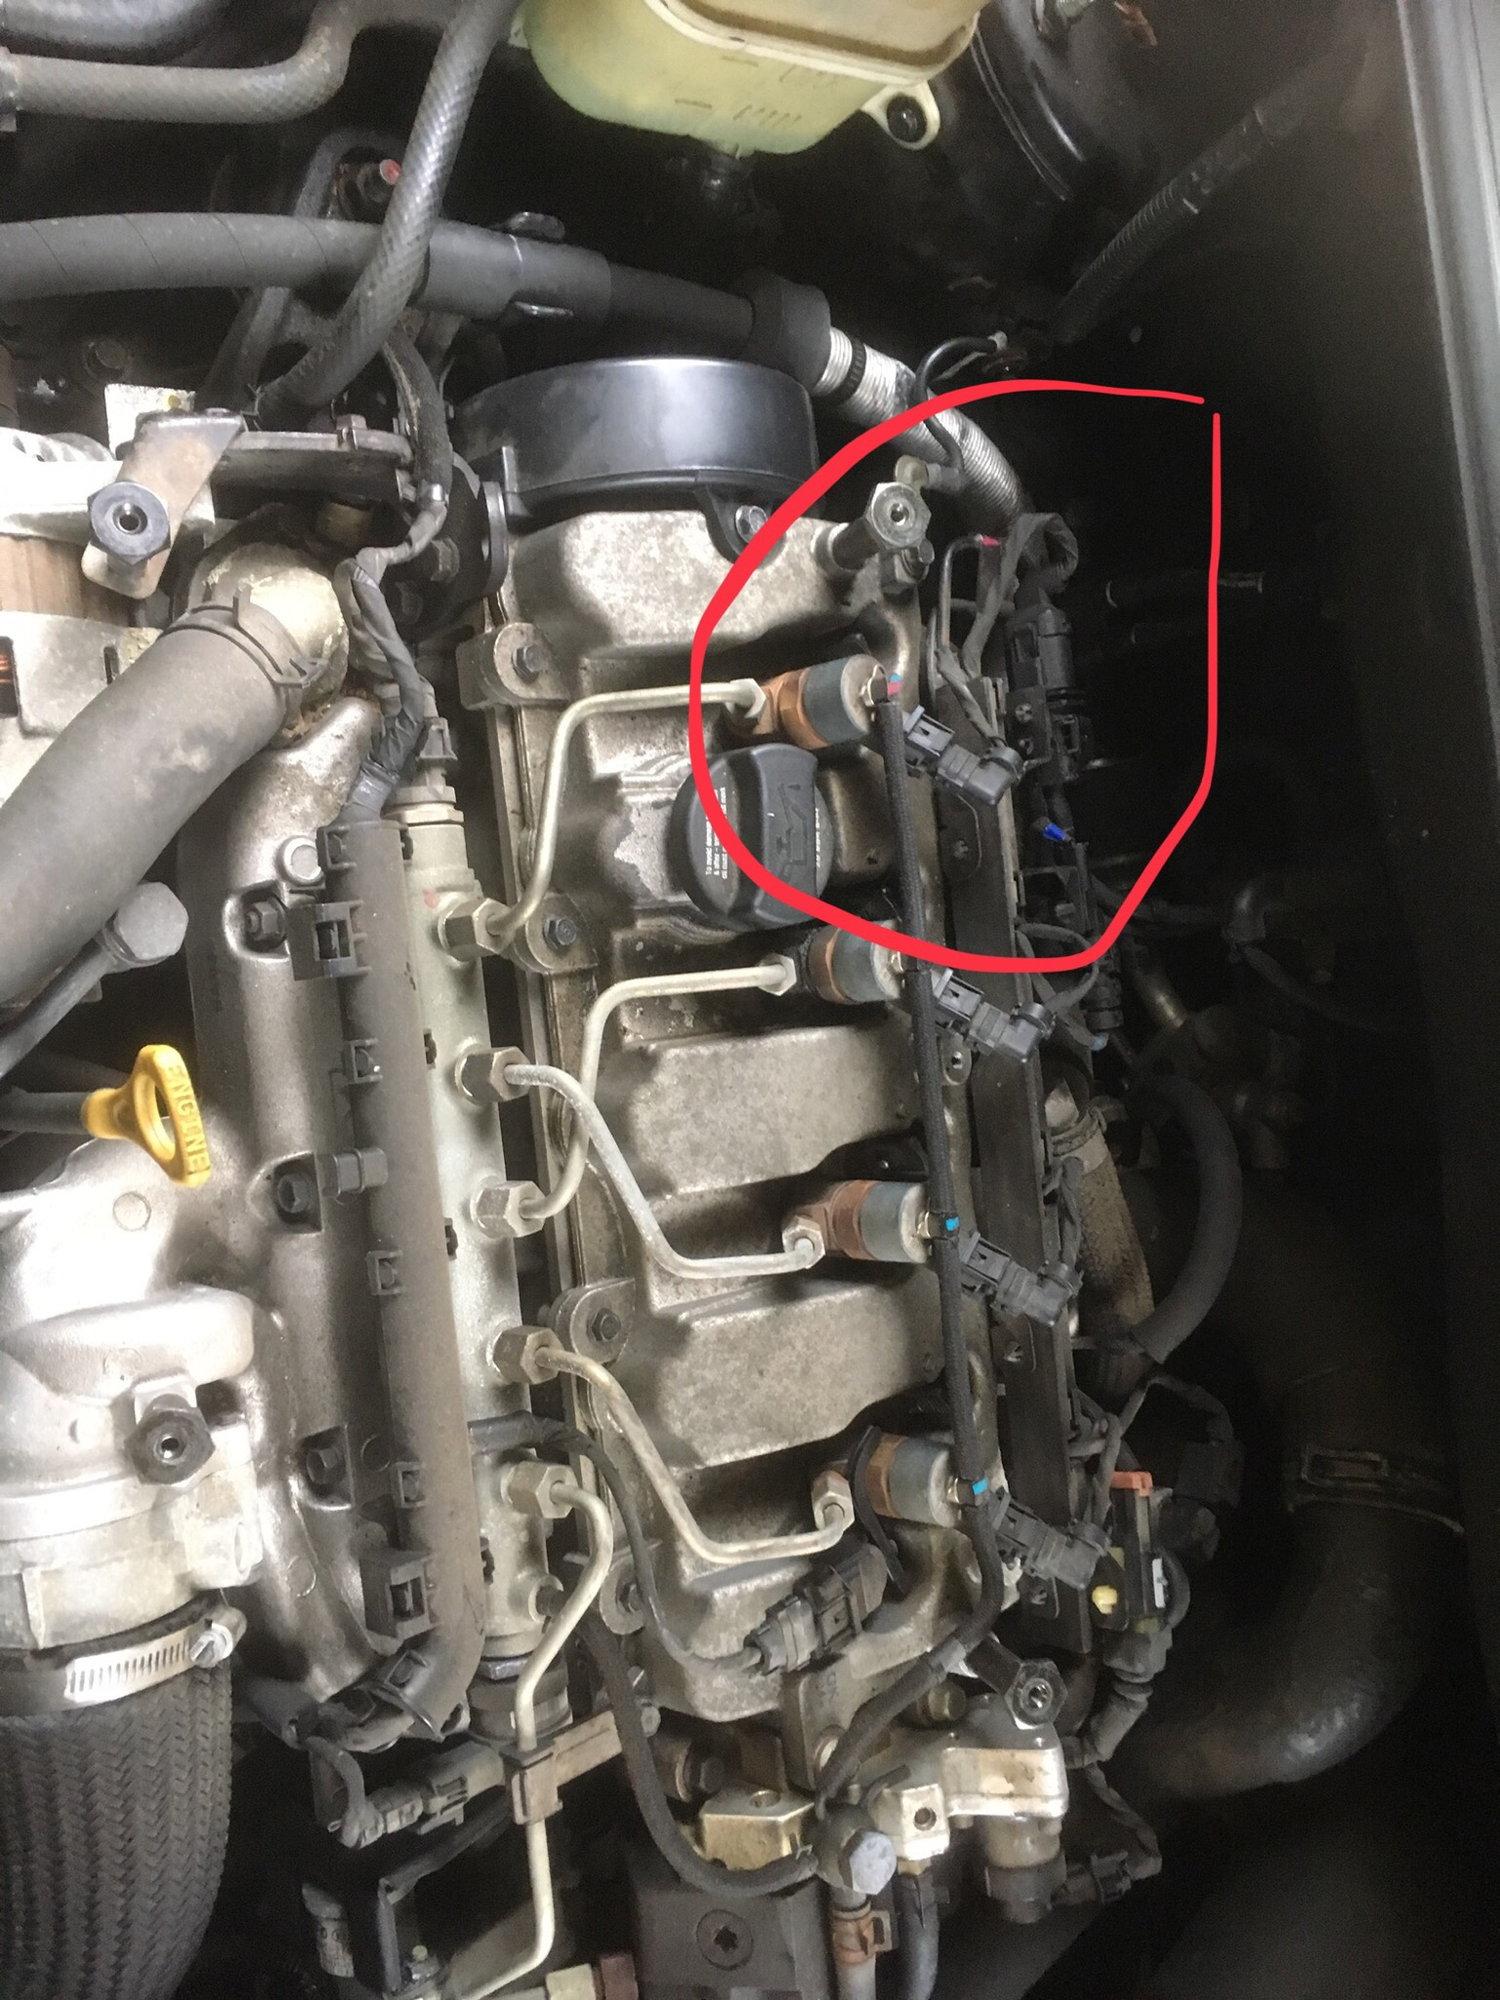 2007 Hyundai Entourage Fuel Filter Location - Wiring Diagram ... on